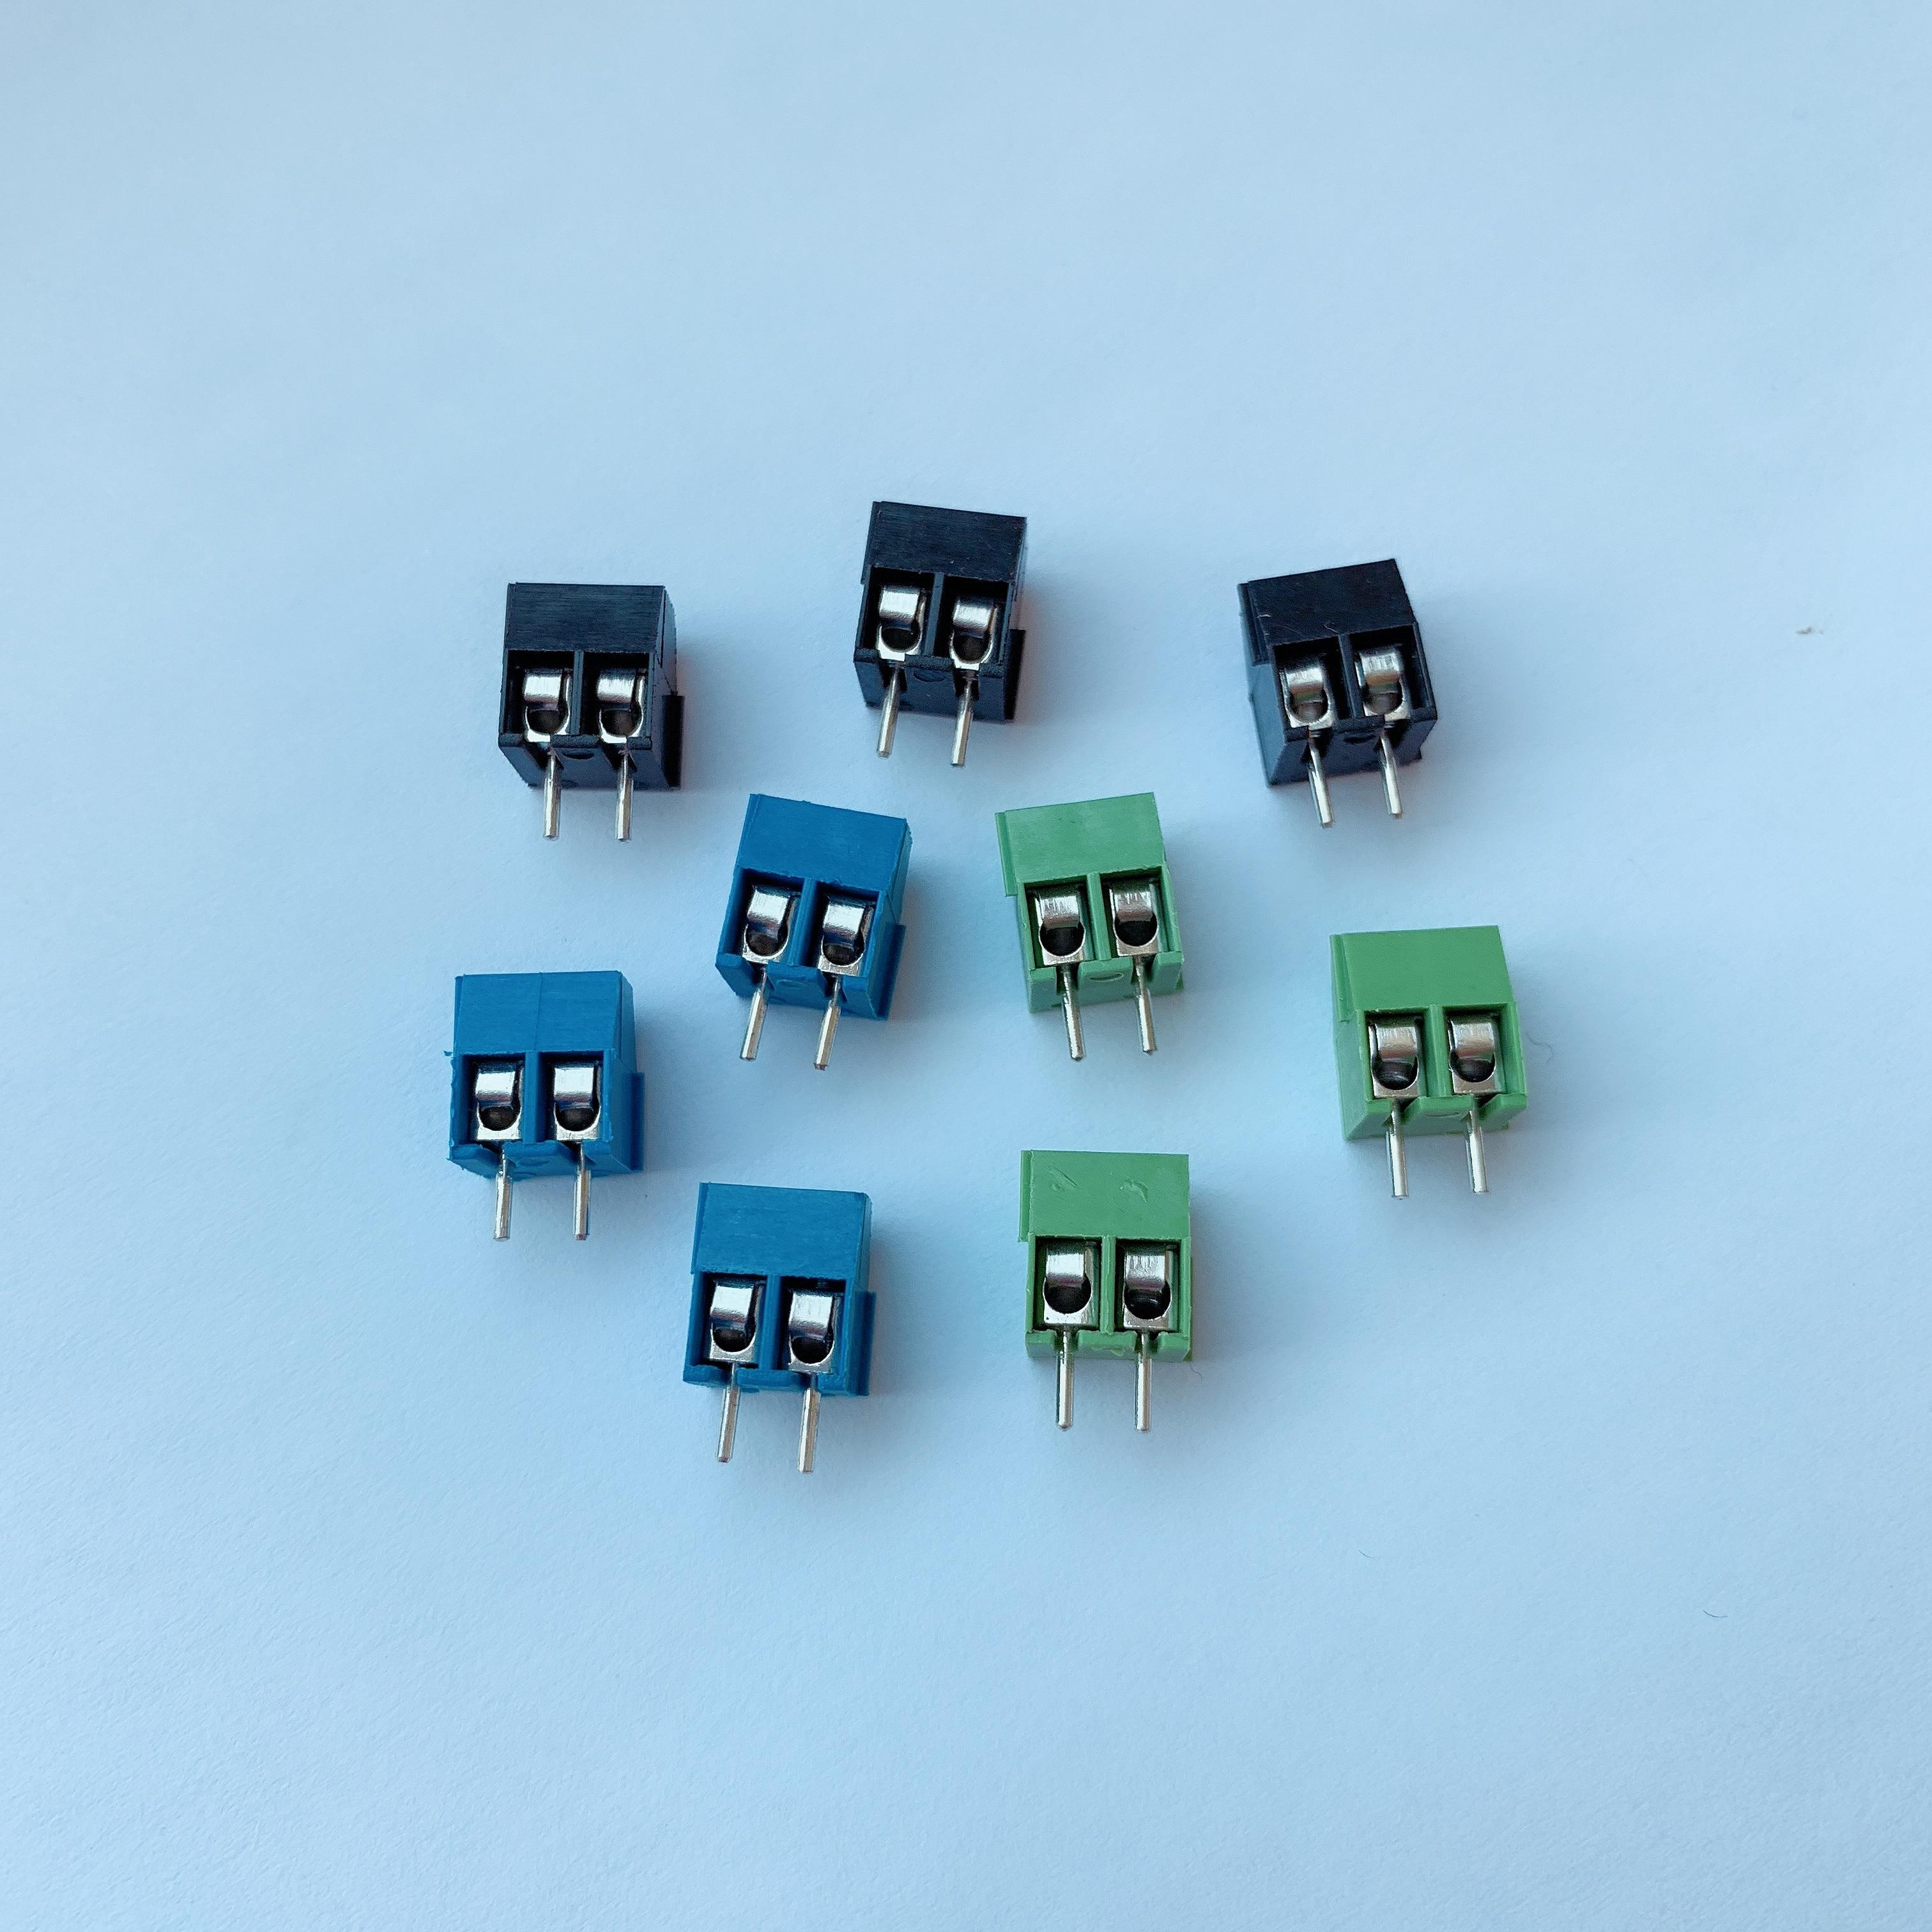 10pcs kf-350 3.5mm המגרש בורג מסוף מחבר 2p ישר רגל KF 350 נחושת ירוק כחול שחור PCB מסוף